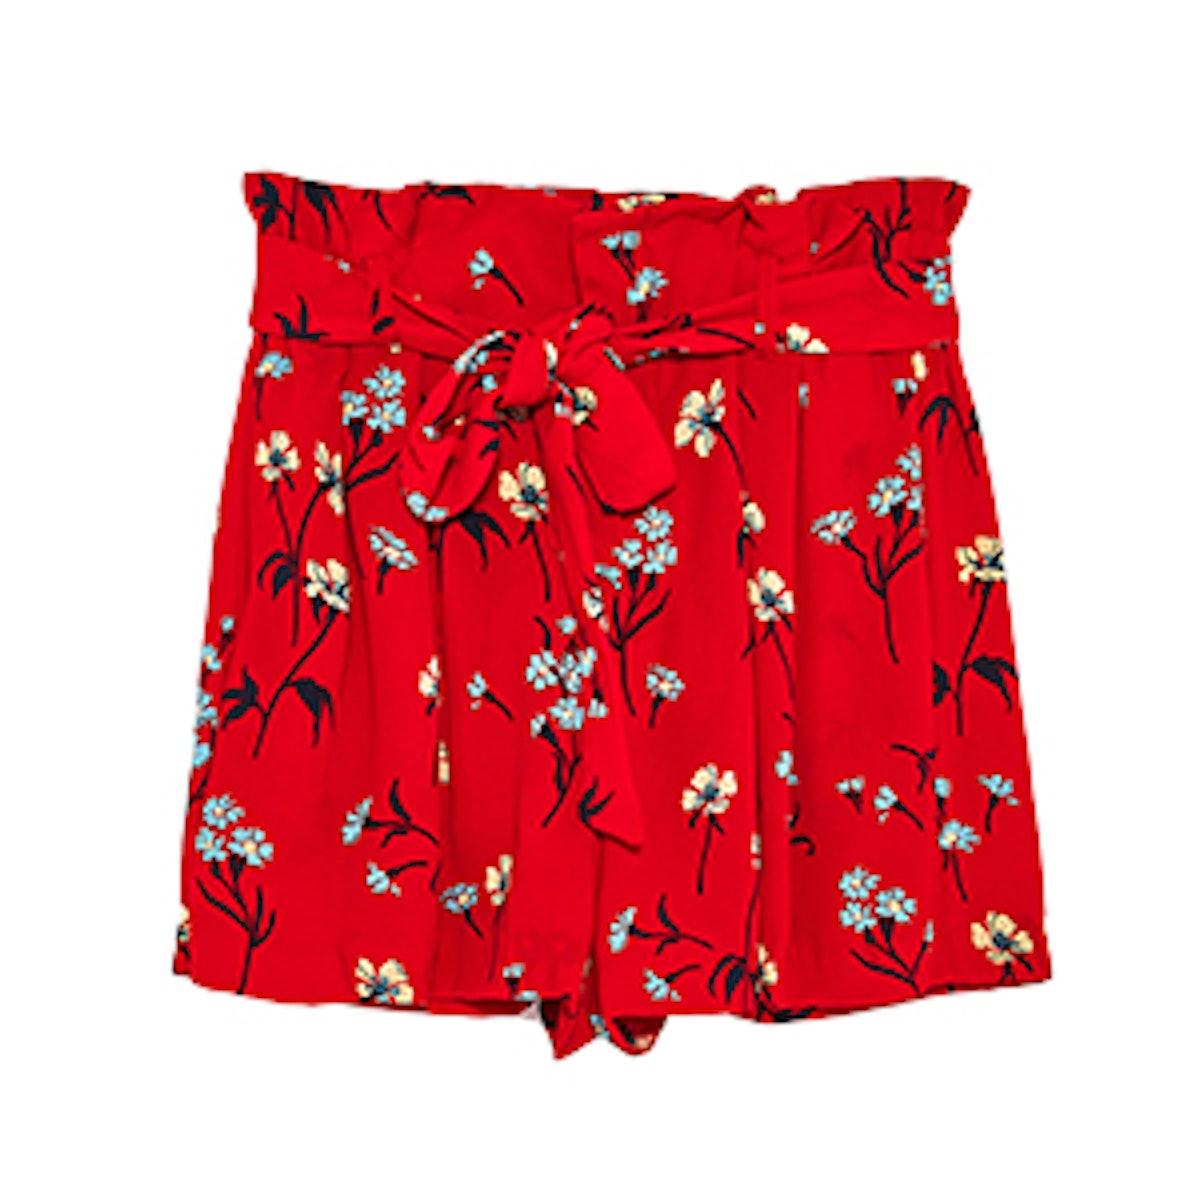 Floral Print Shorts